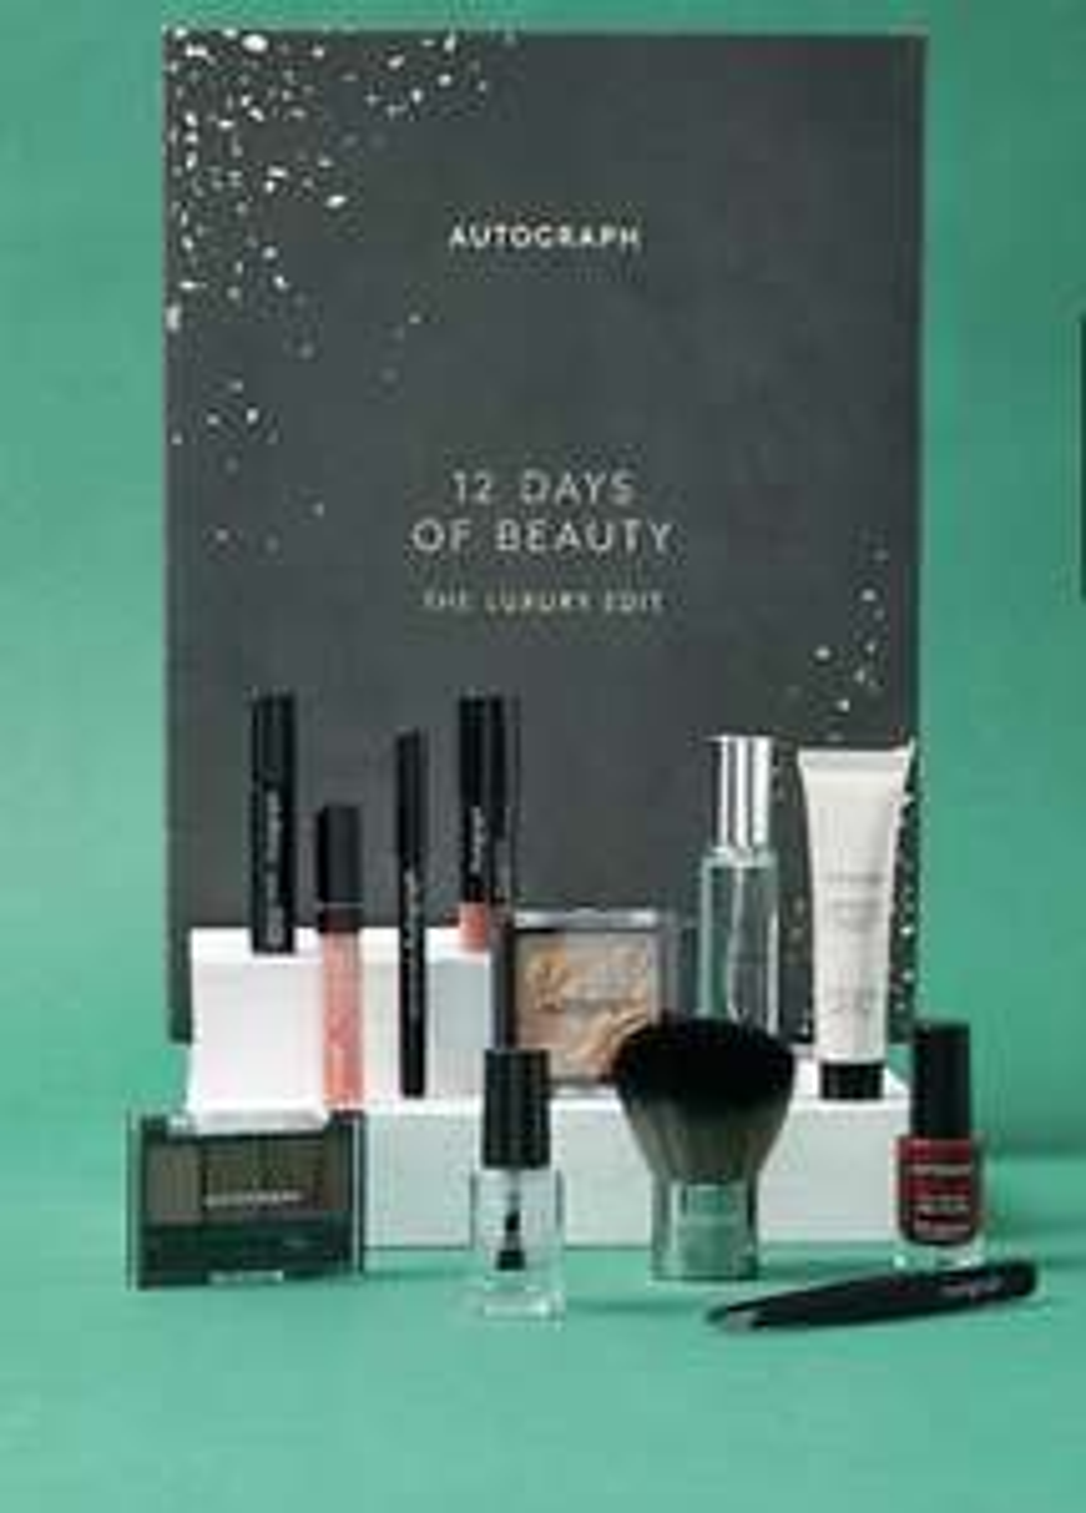 Marks & Spencer Autograph 12 Days of Beauty Advent Calendar now Half Price - £35 @ M&S